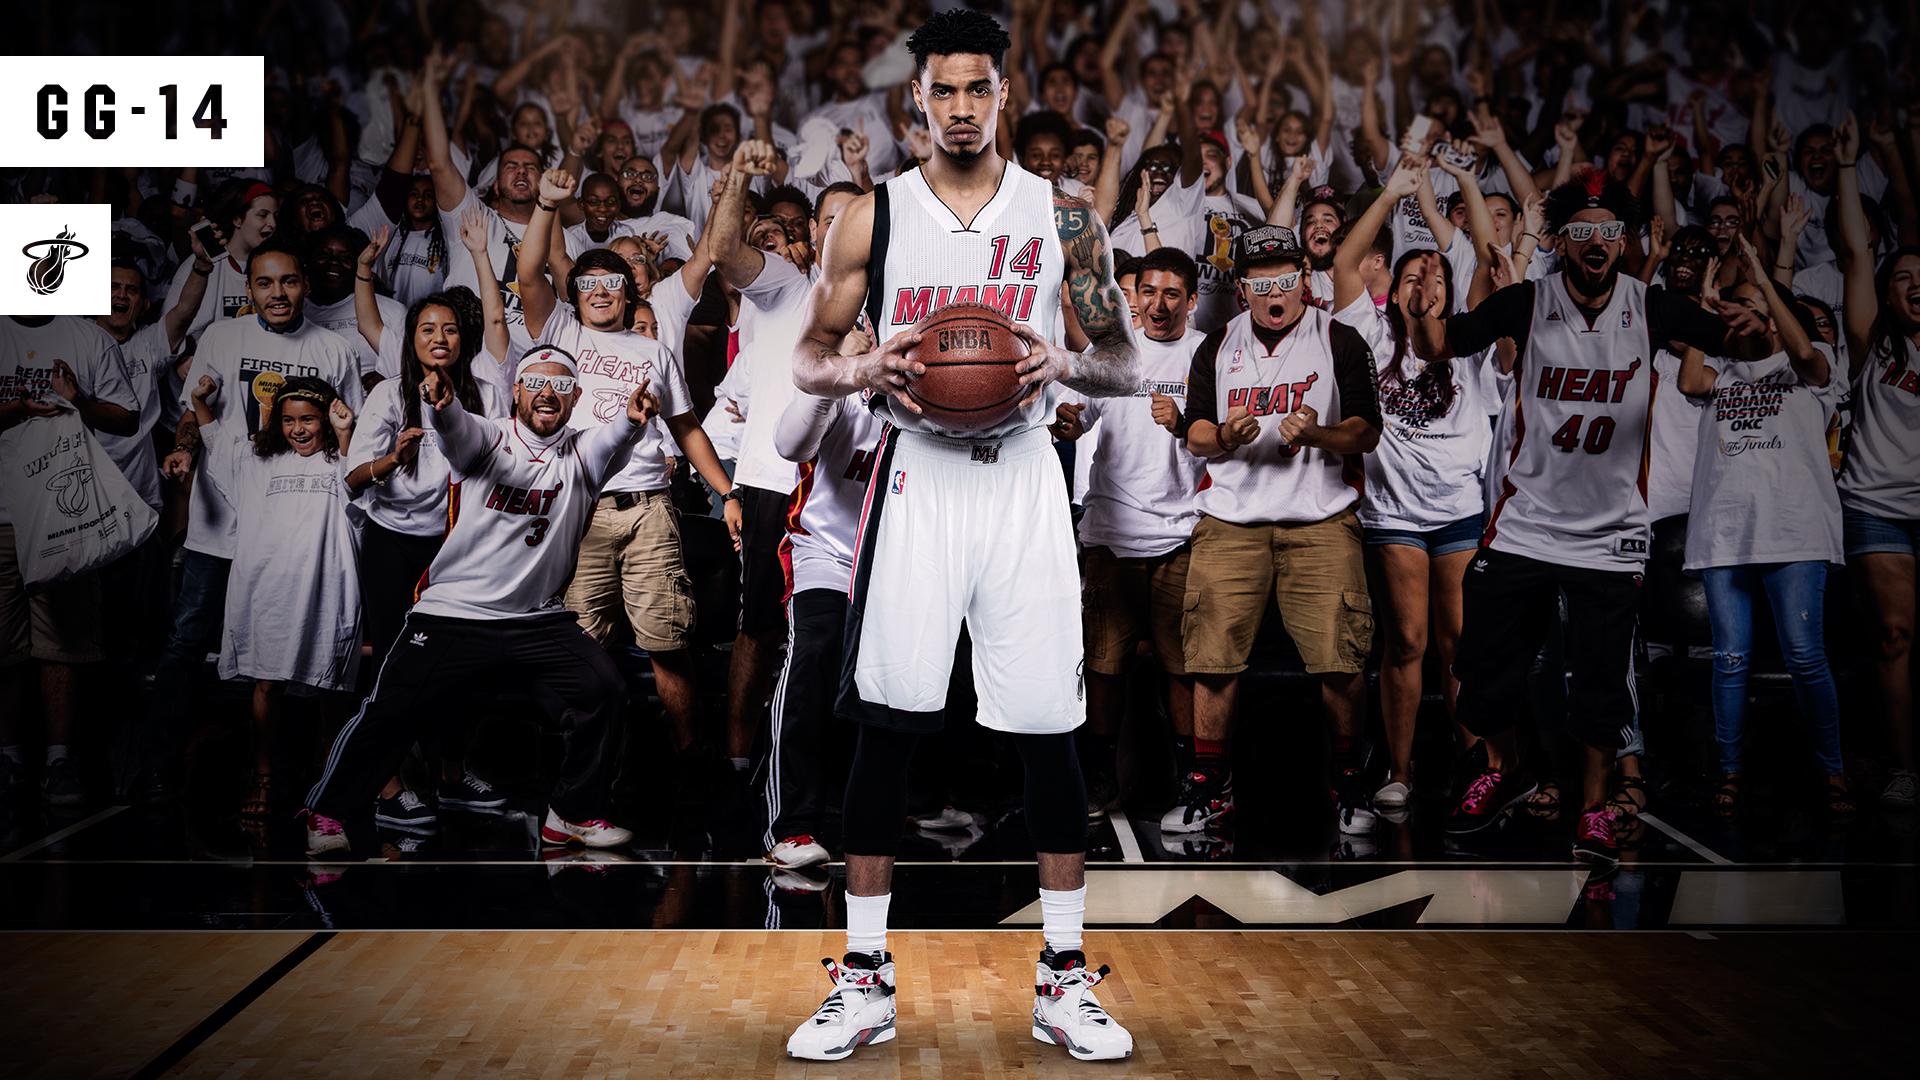 Miami Heat Basketball NBA Wallpaper 1080p hd background hd 1920x1080